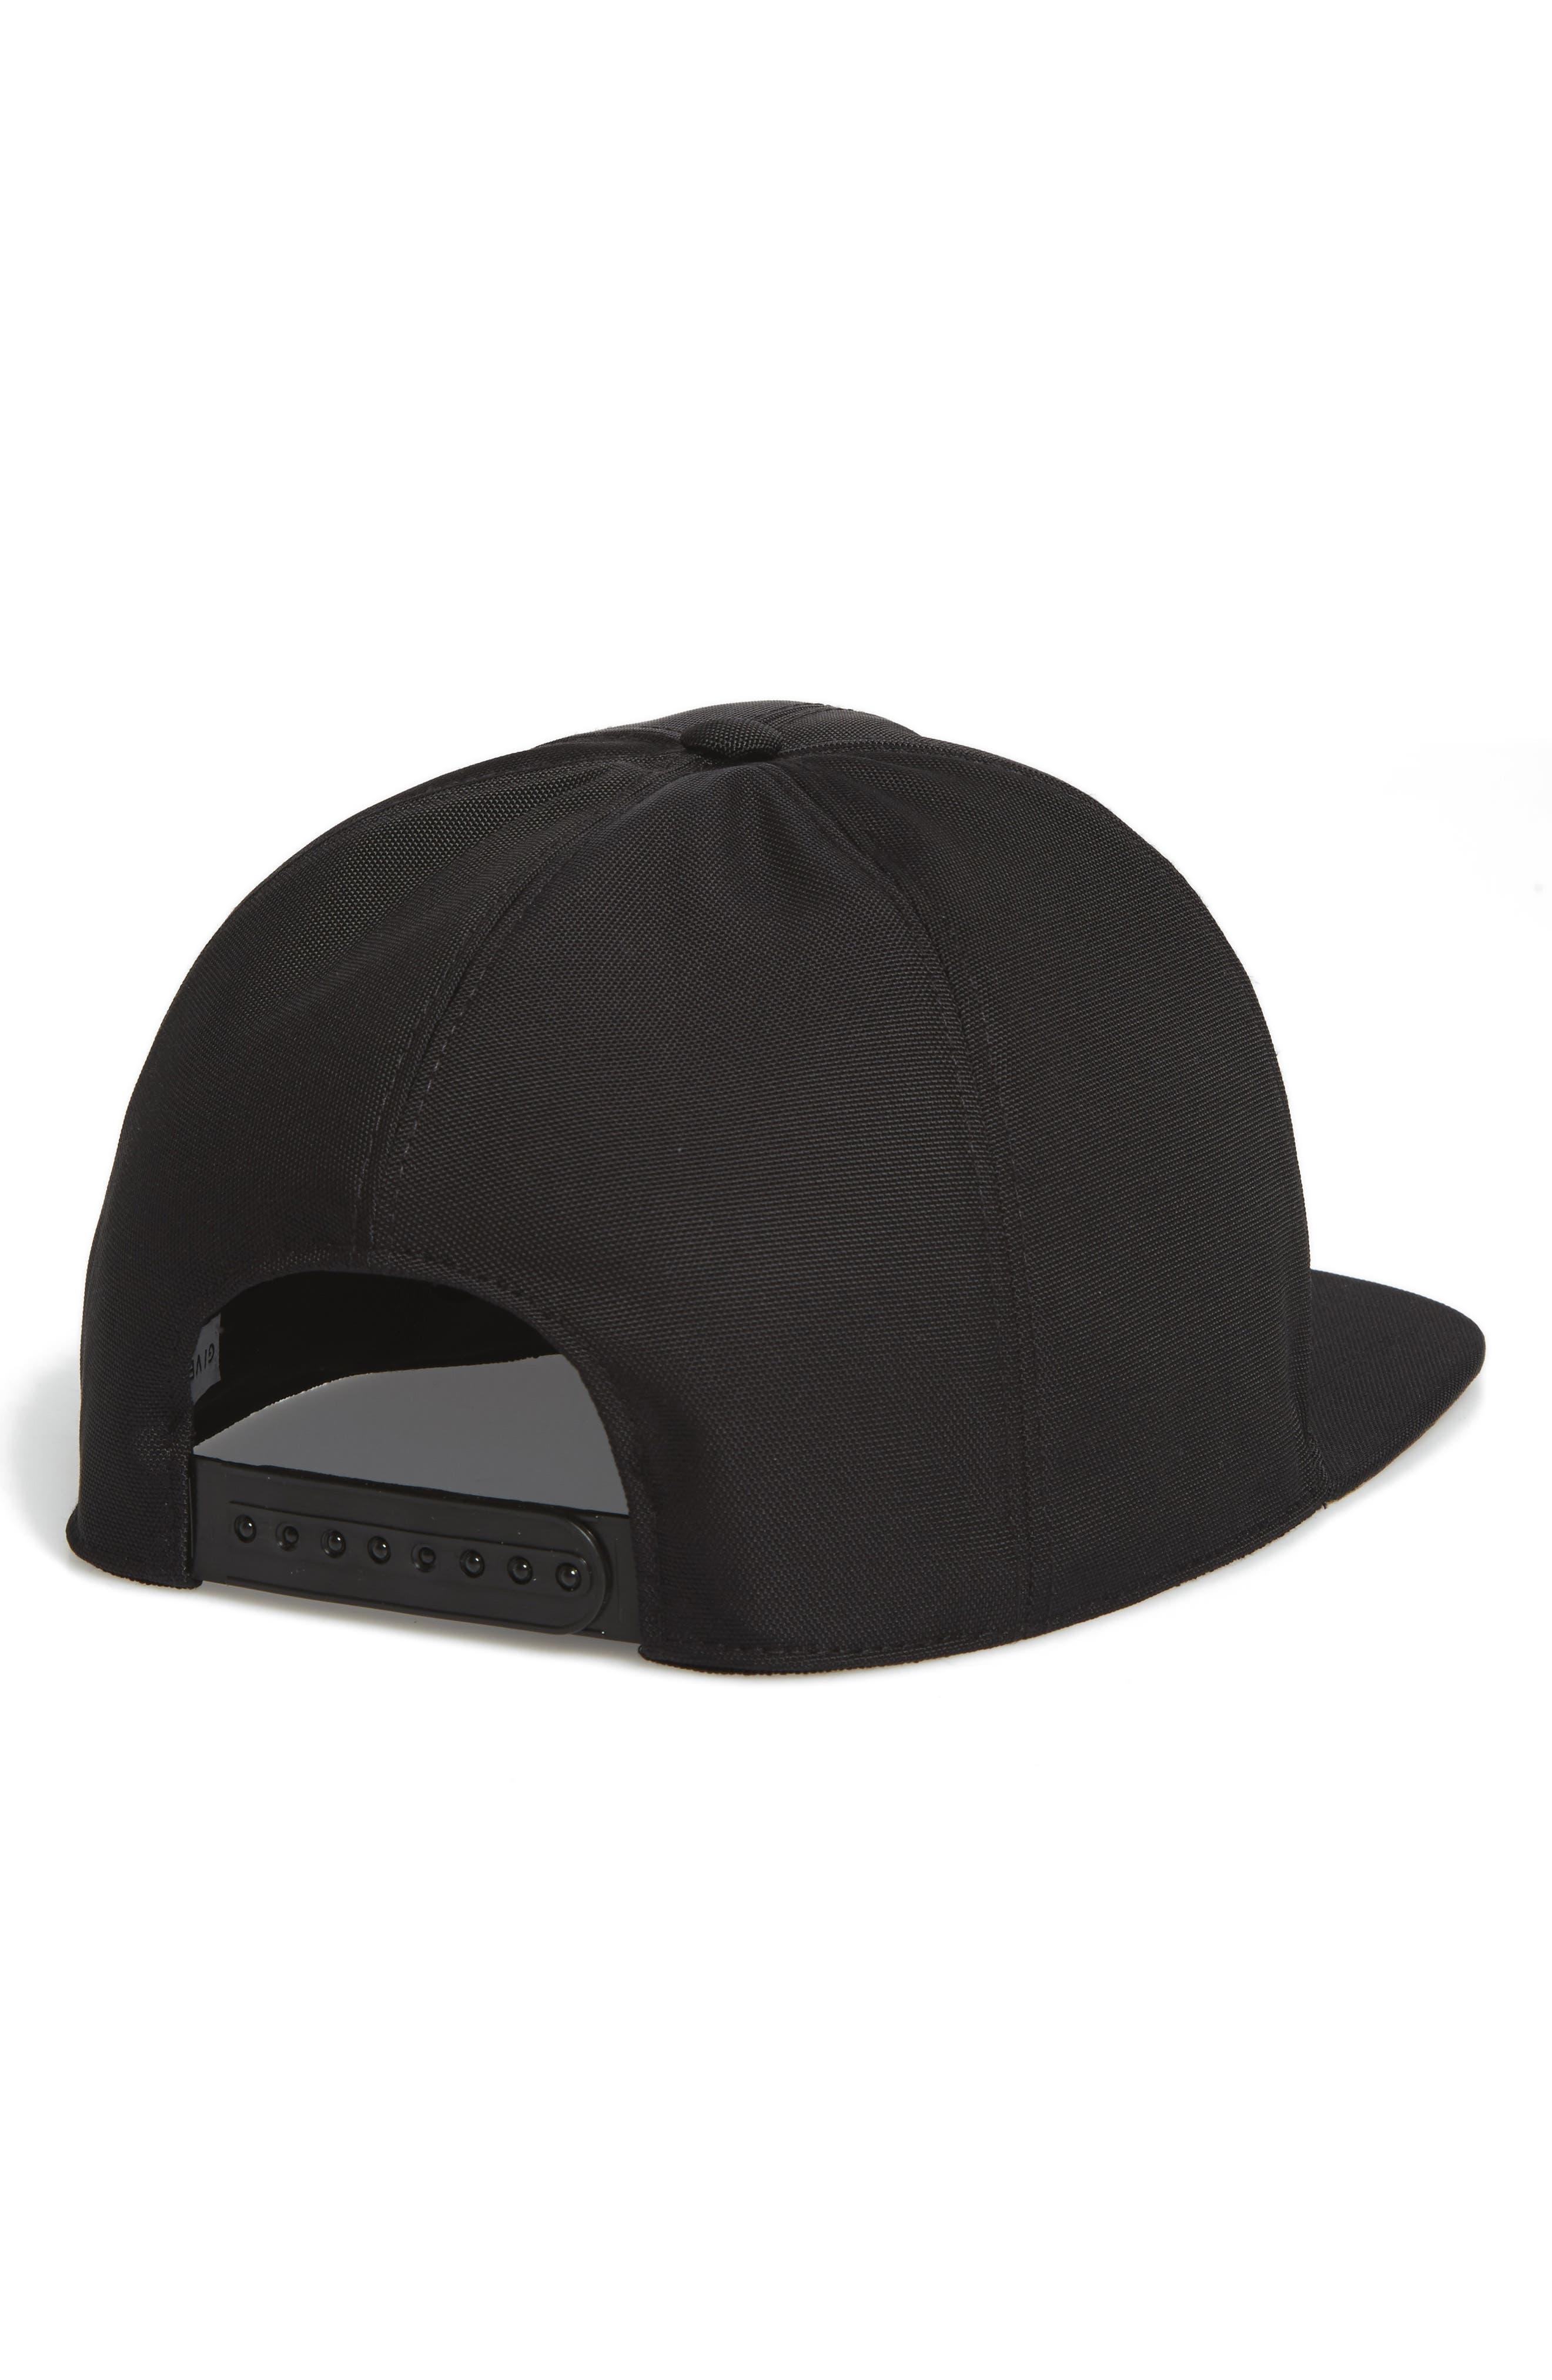 Embroidered Baseball Cap,                             Alternate thumbnail 2, color,                             Black Multi